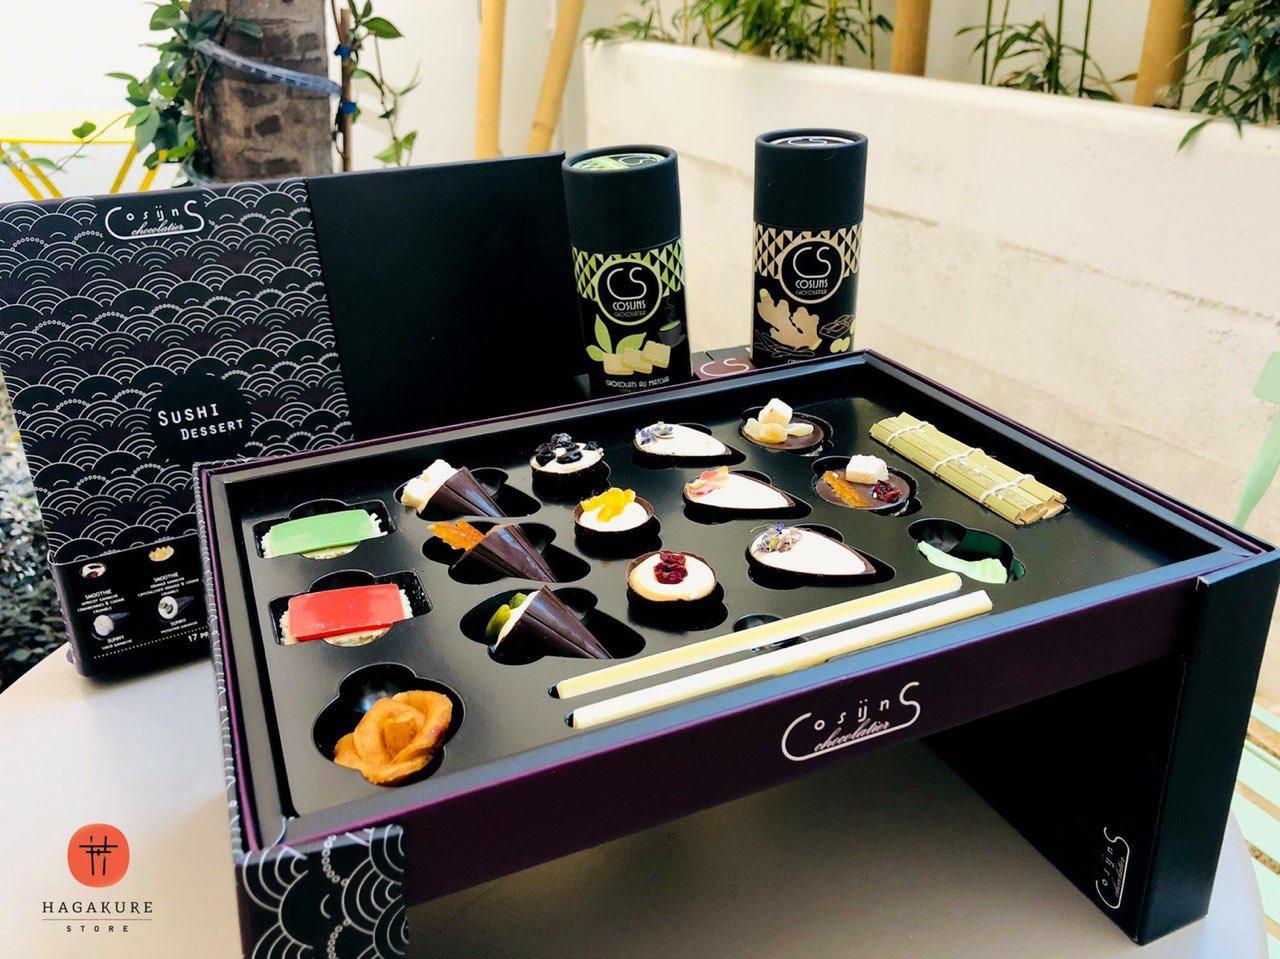 hagakure sushi fusion SUSHI DESSERT CHOCOLATE